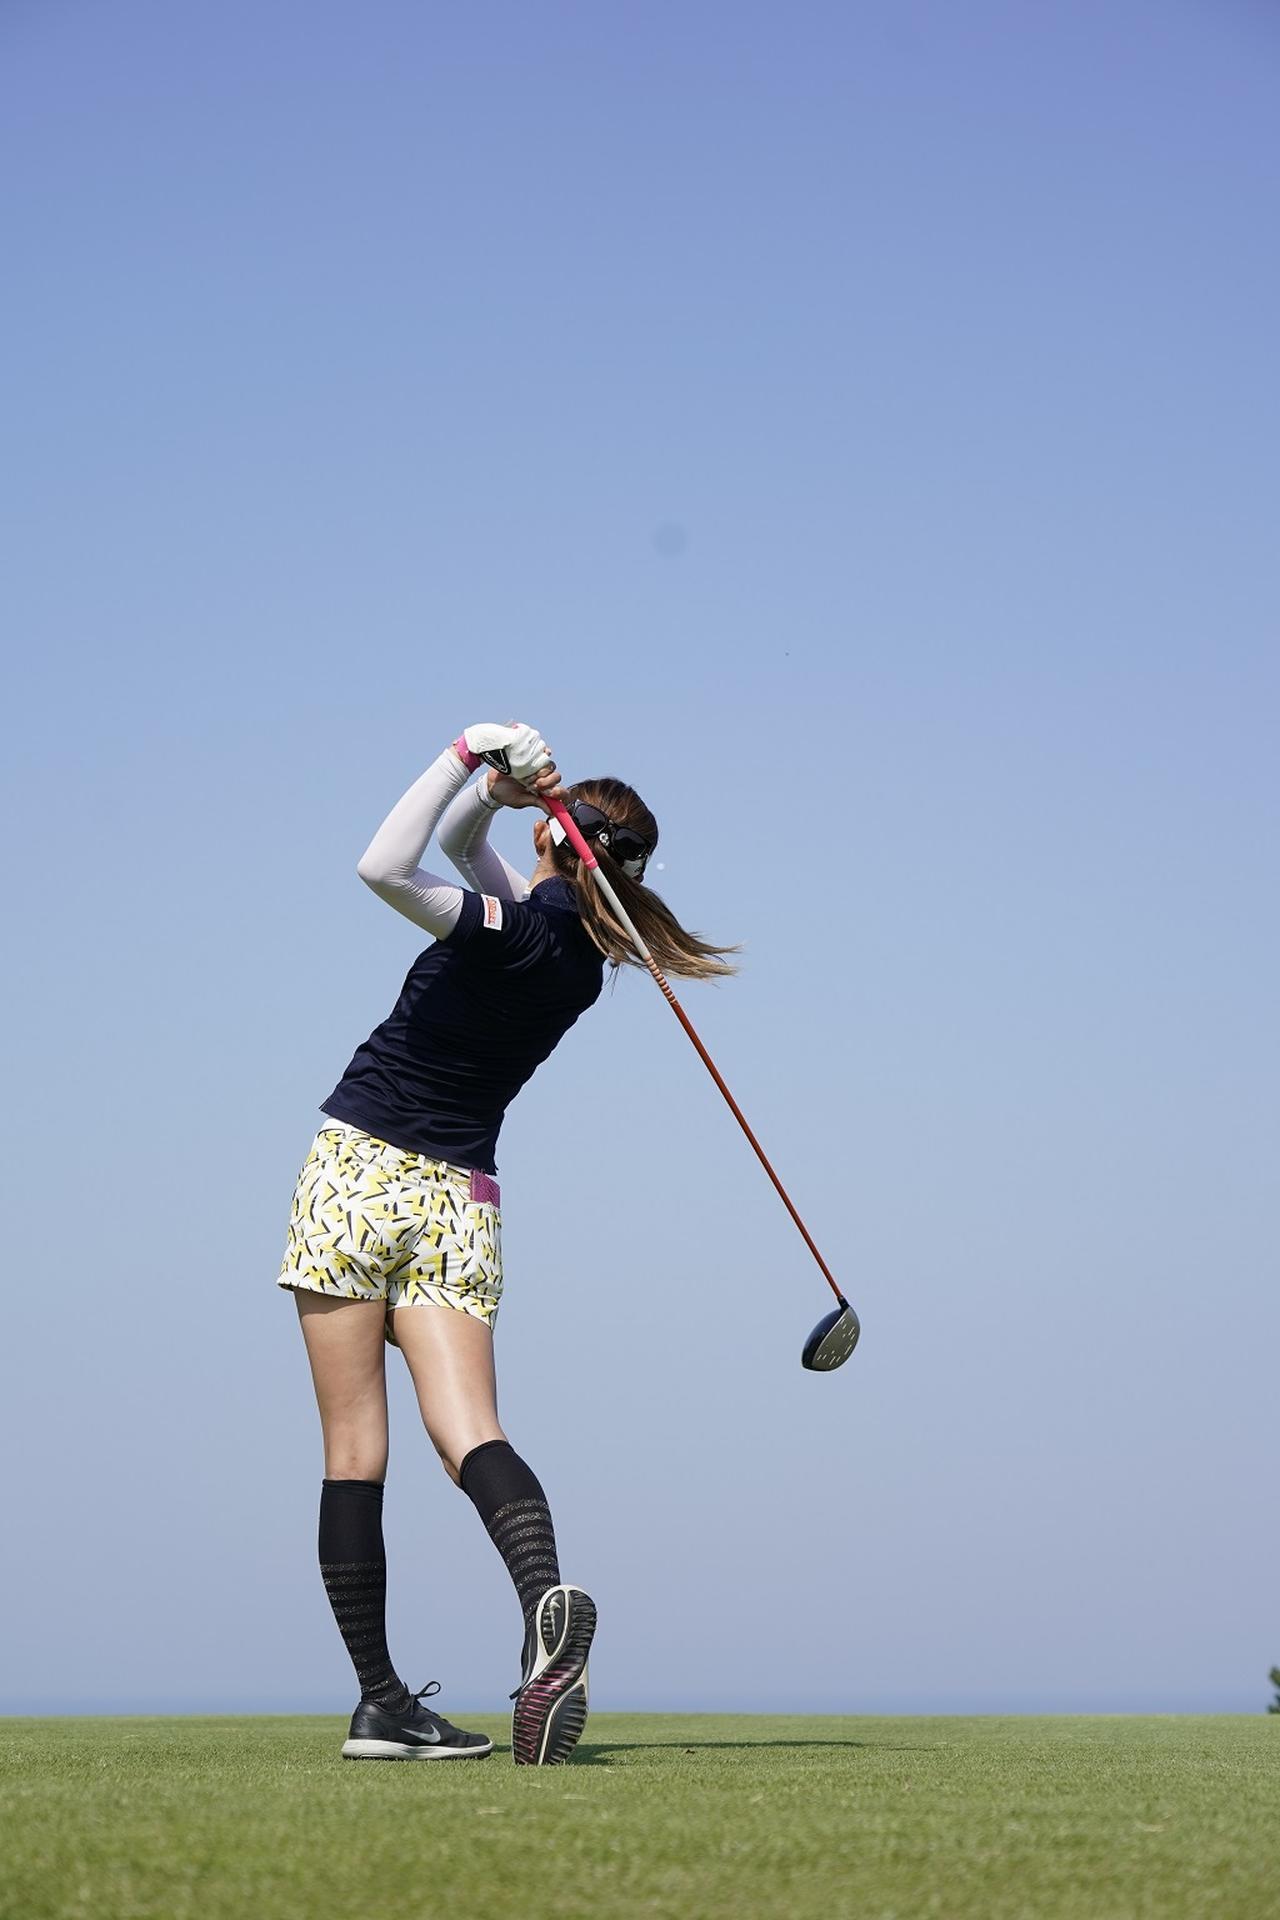 Images : 14番目の画像 - 金田久美子ドライバー後方連続写真 - みんなのゴルフダイジェスト